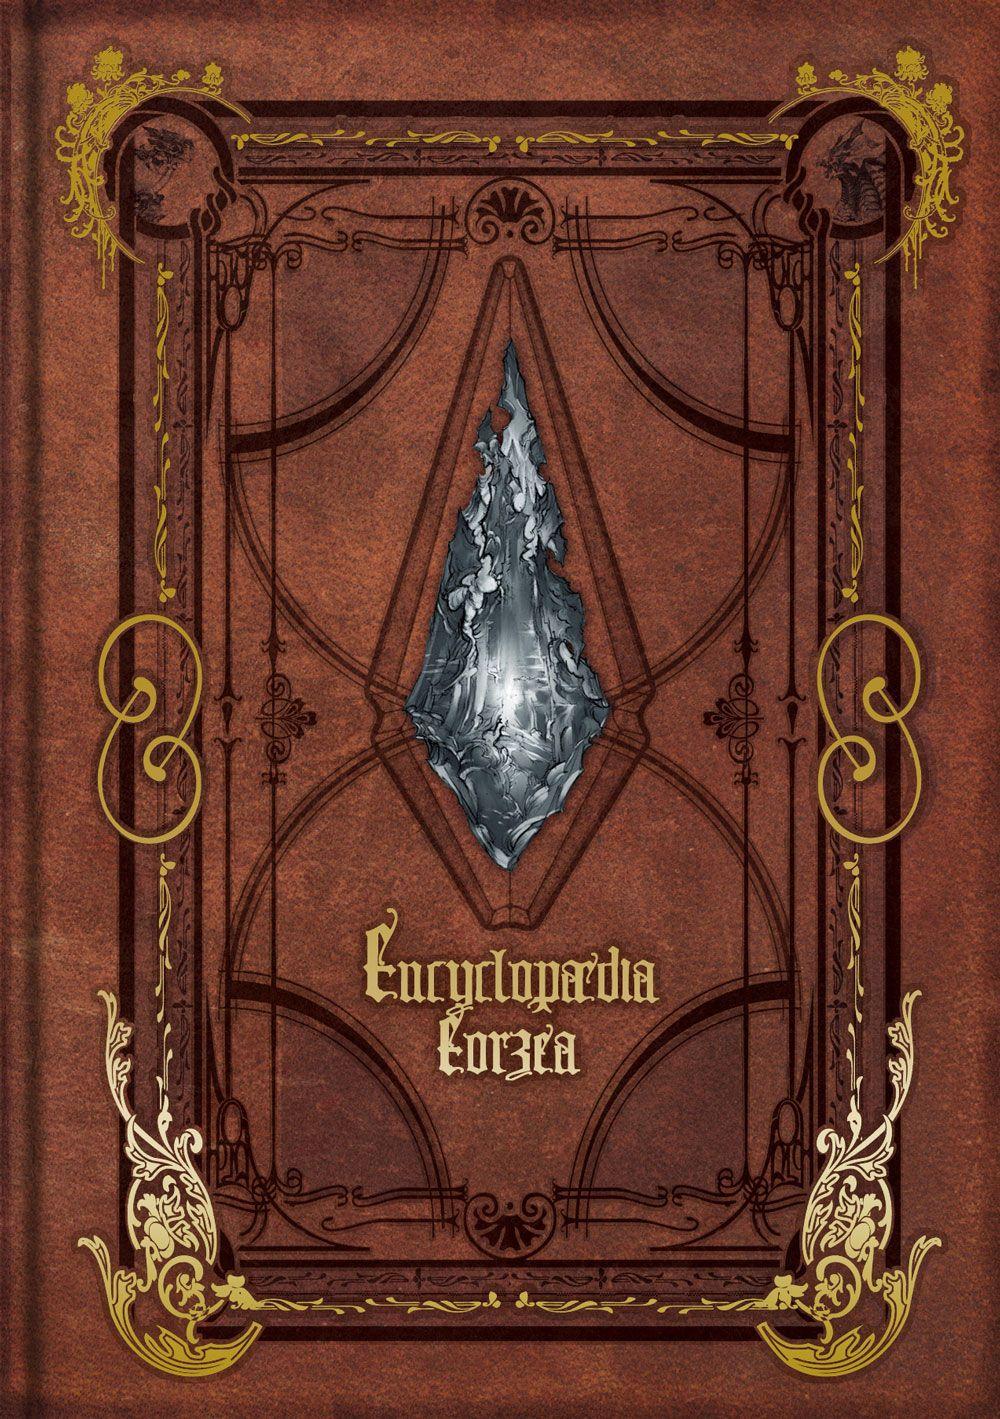 Encyclopædia Eorzea: The World of Final Fantasy XIV